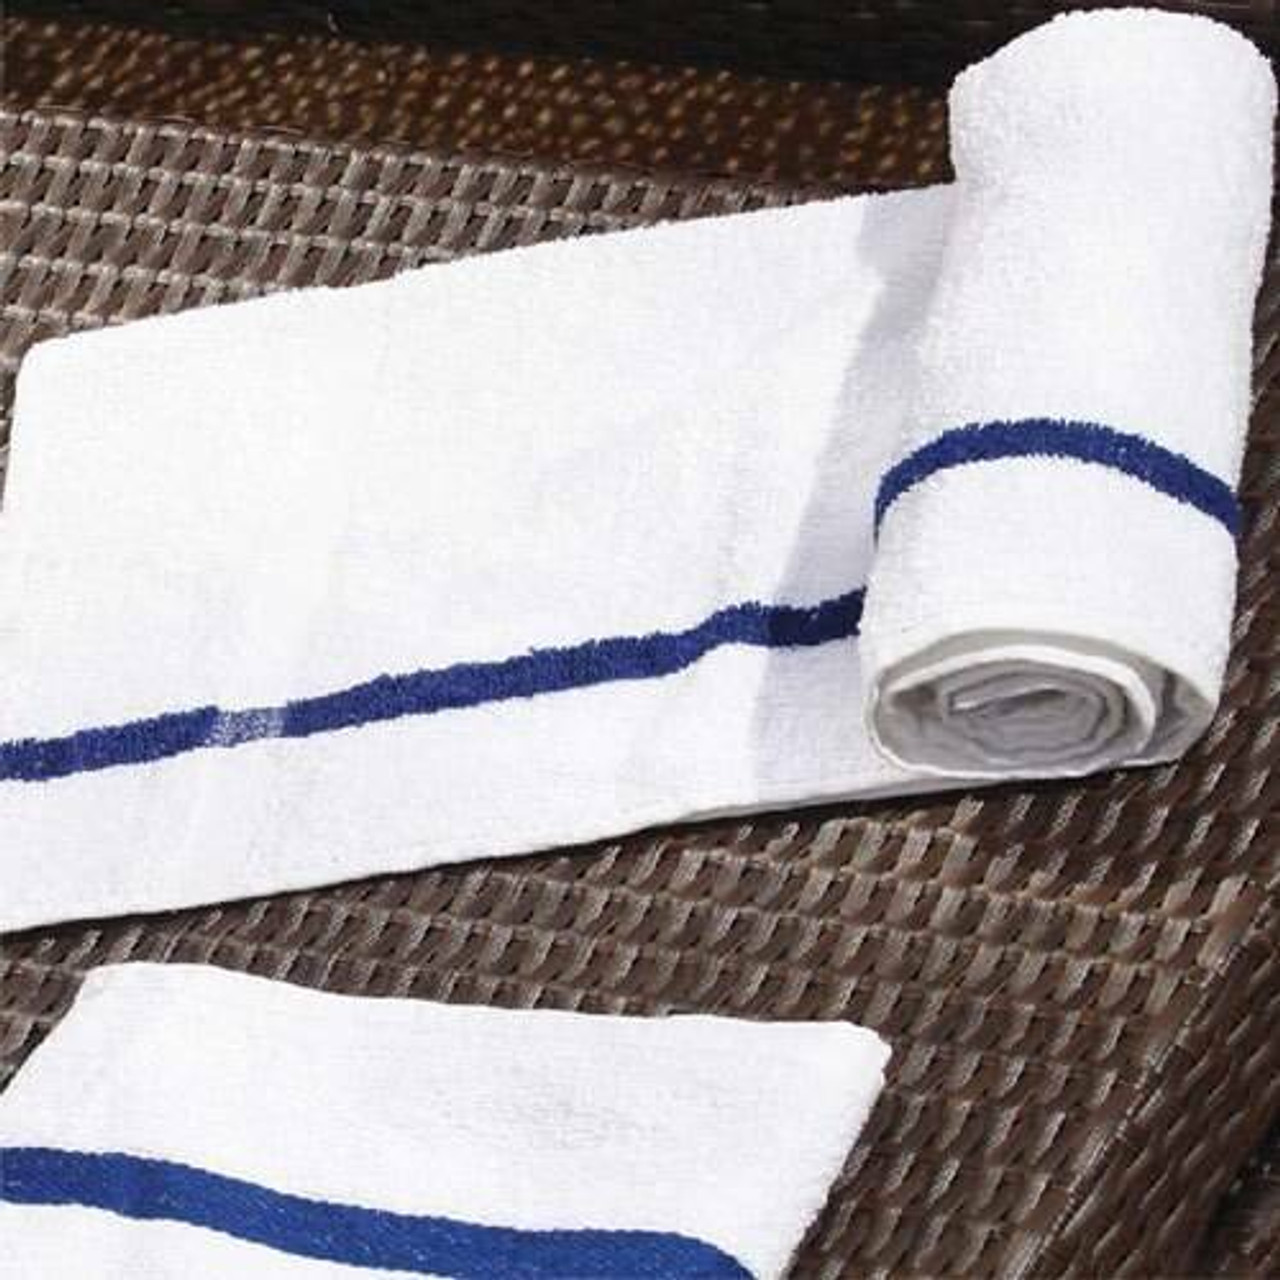 Ganesh Mills or Oxford Super Blend Ganesh Mills or Classic Blue Center Stripe Pool Towels or Pack of 5-10 DZ